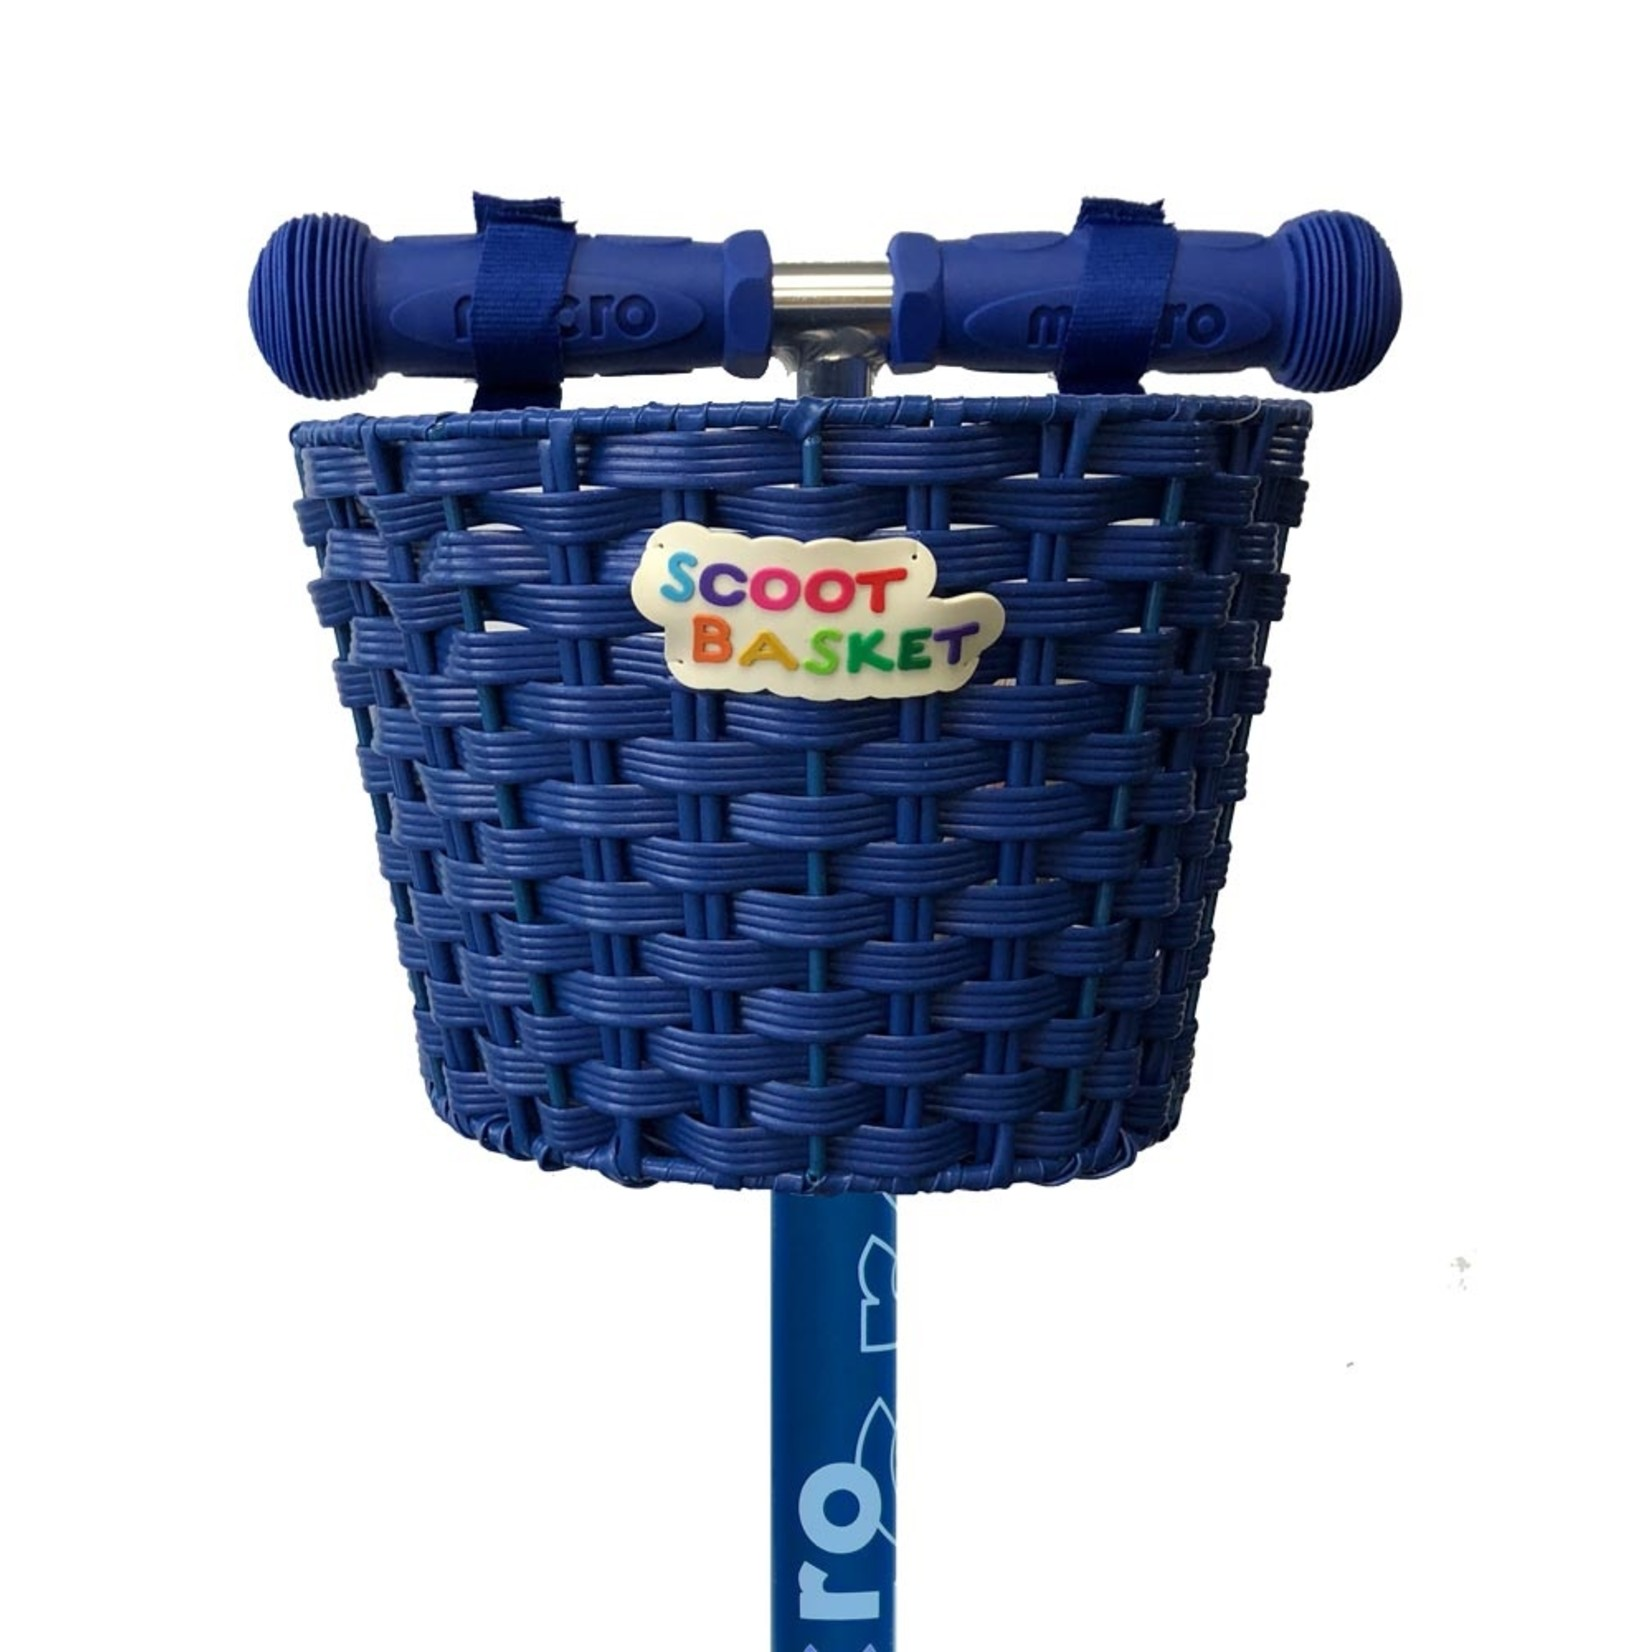 Micro Scoot Basket